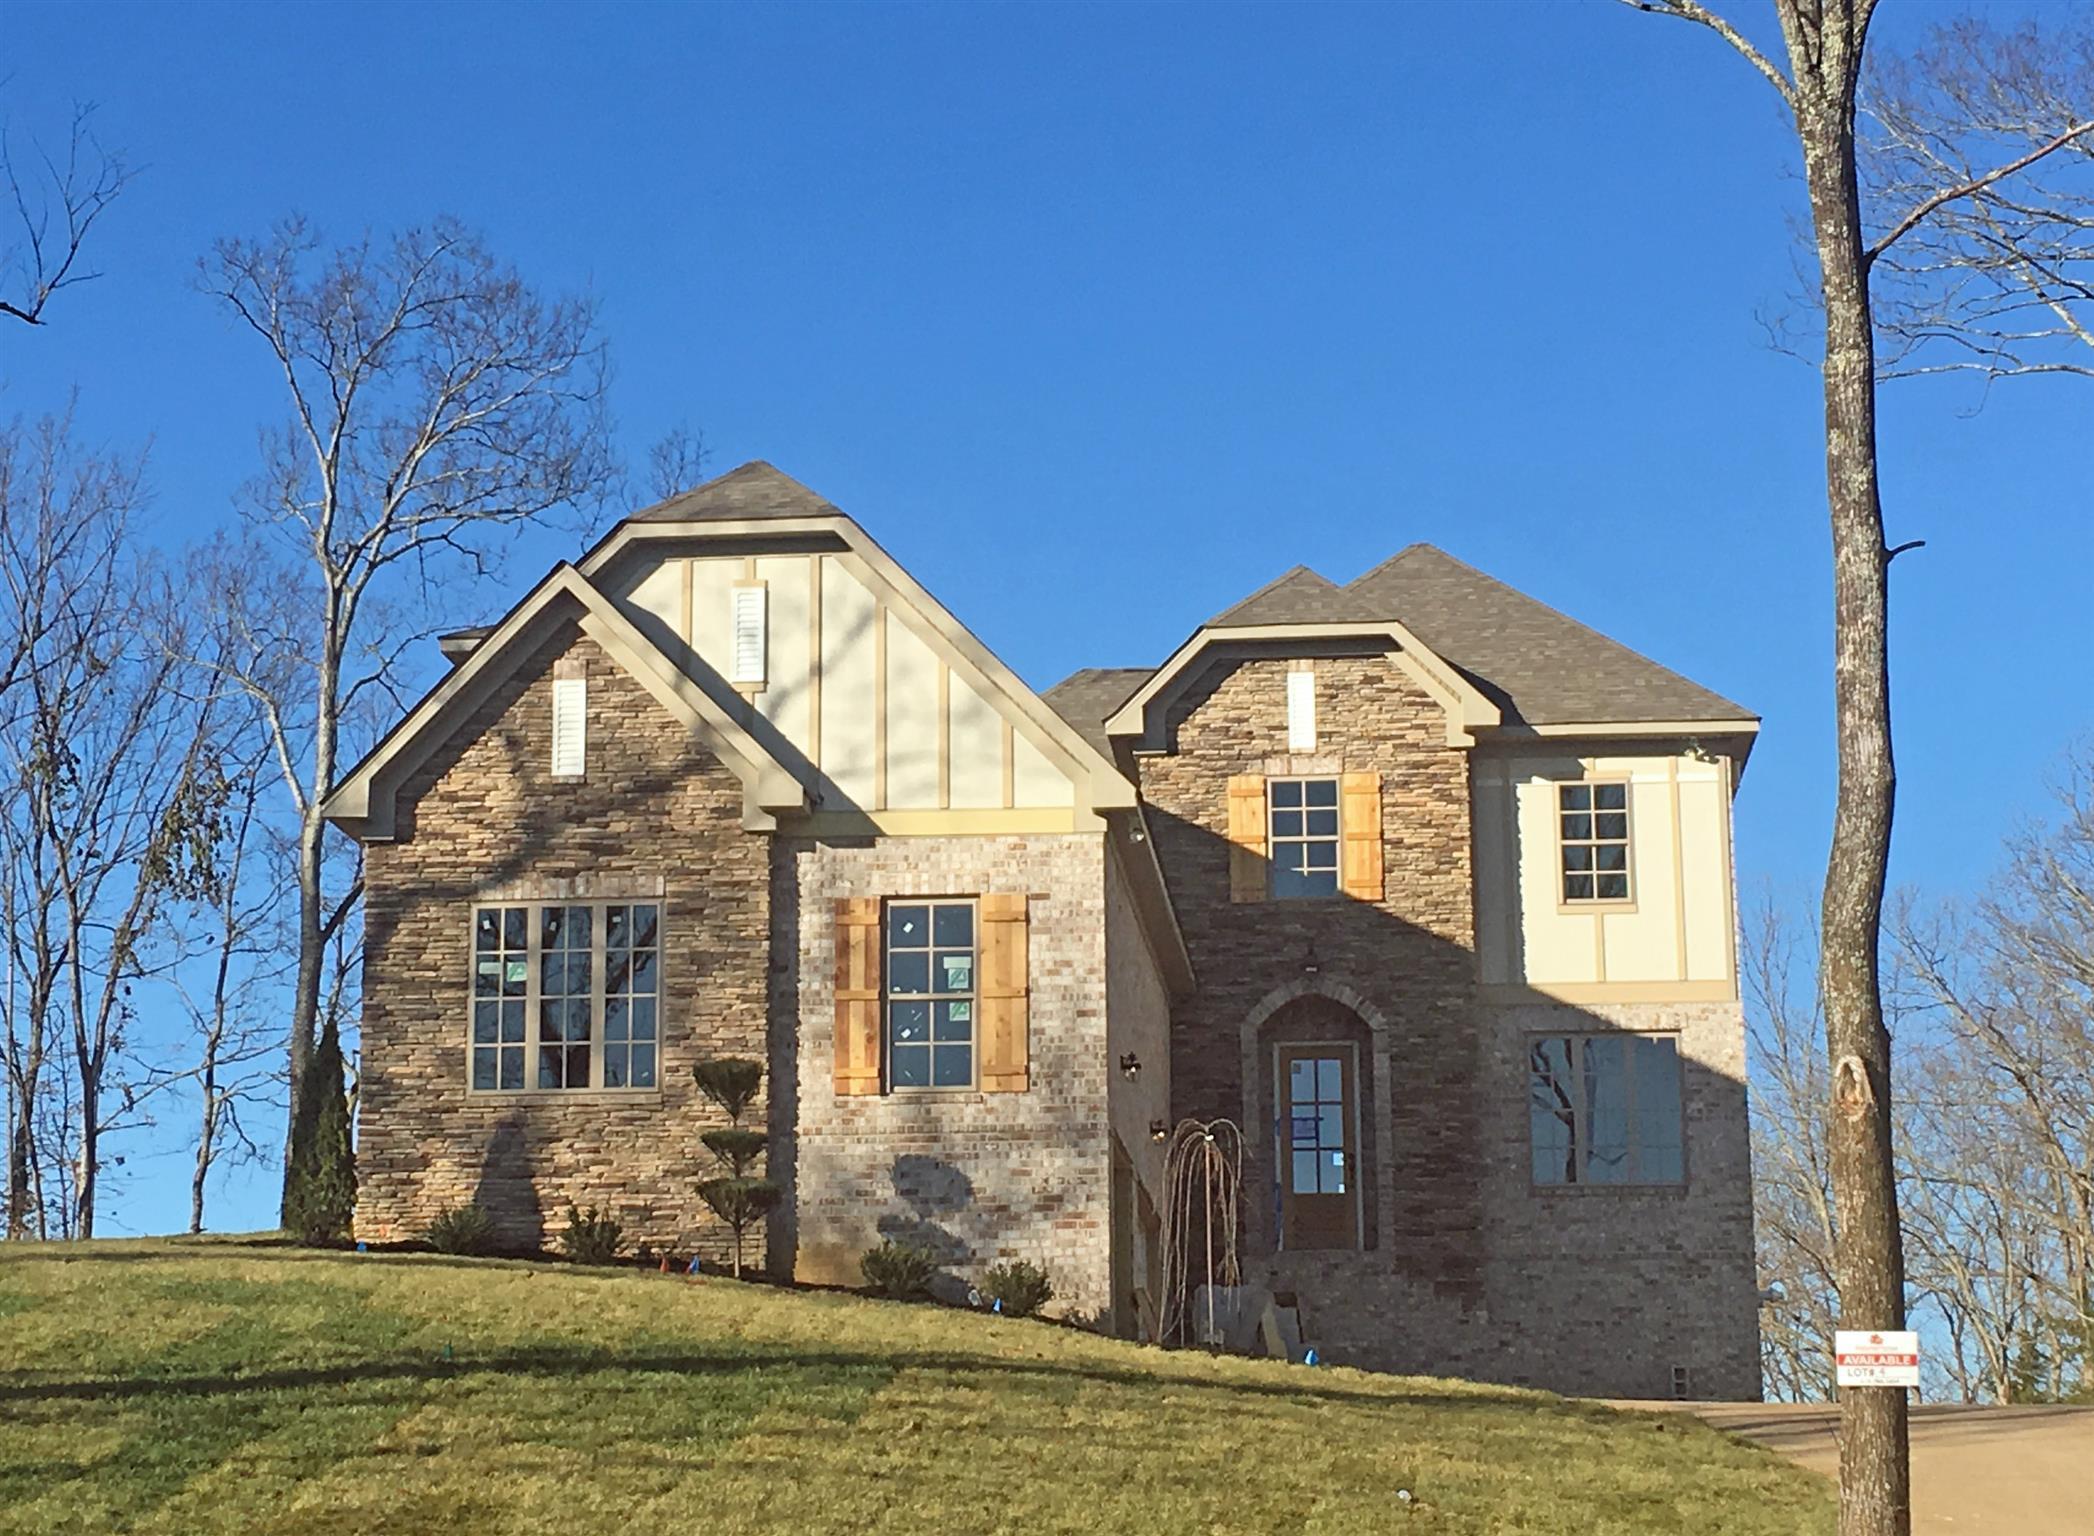 212 Belvedere Cir 37135 - One of Nolensville Homes for Sale